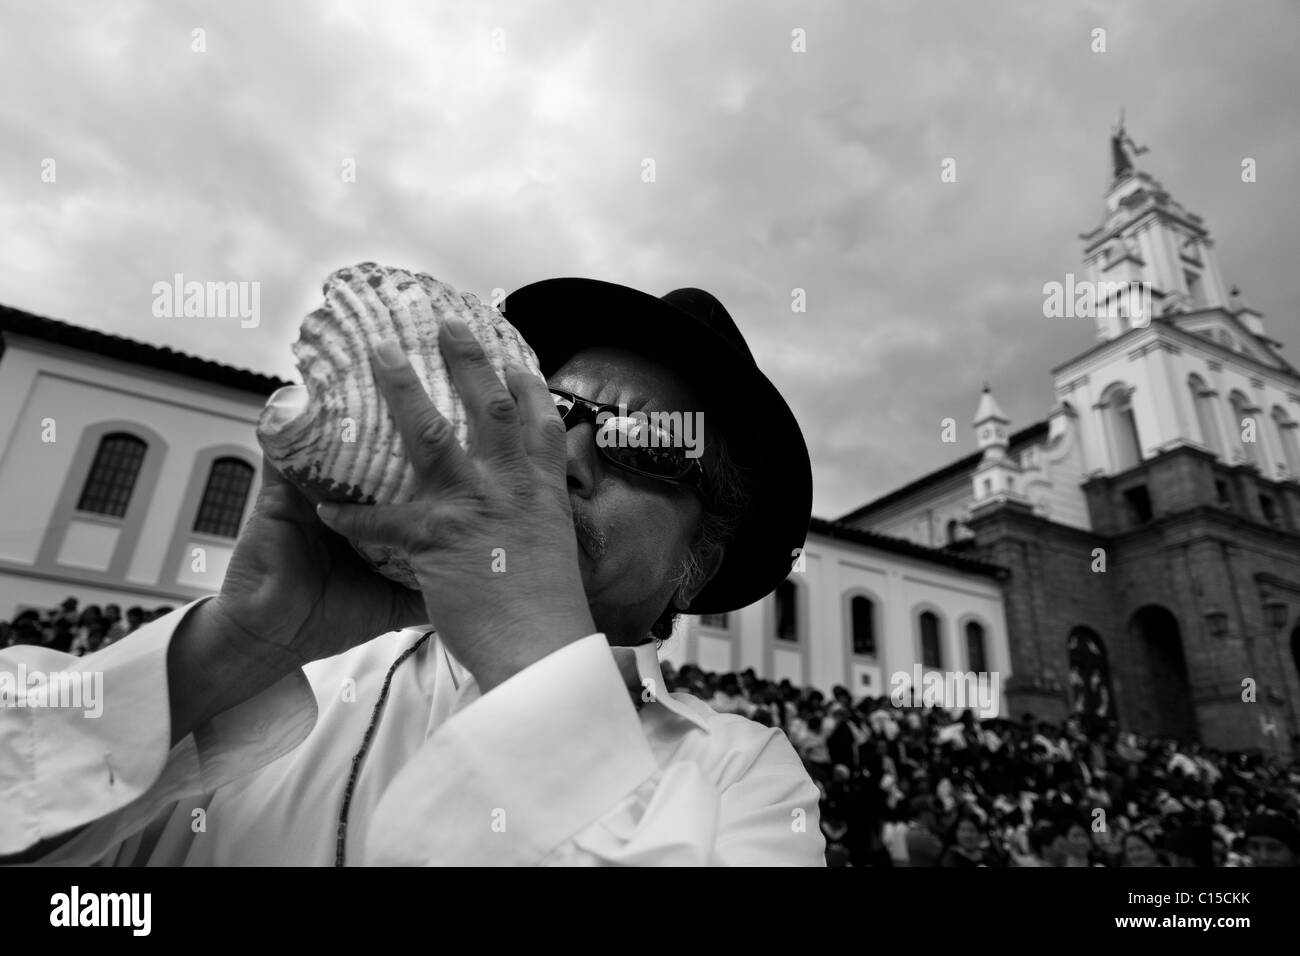 An Indian blows a shell trumpet during the Inti Raymi (San Juan) festivities in Cotacachi, Ecuador. - Stock Image